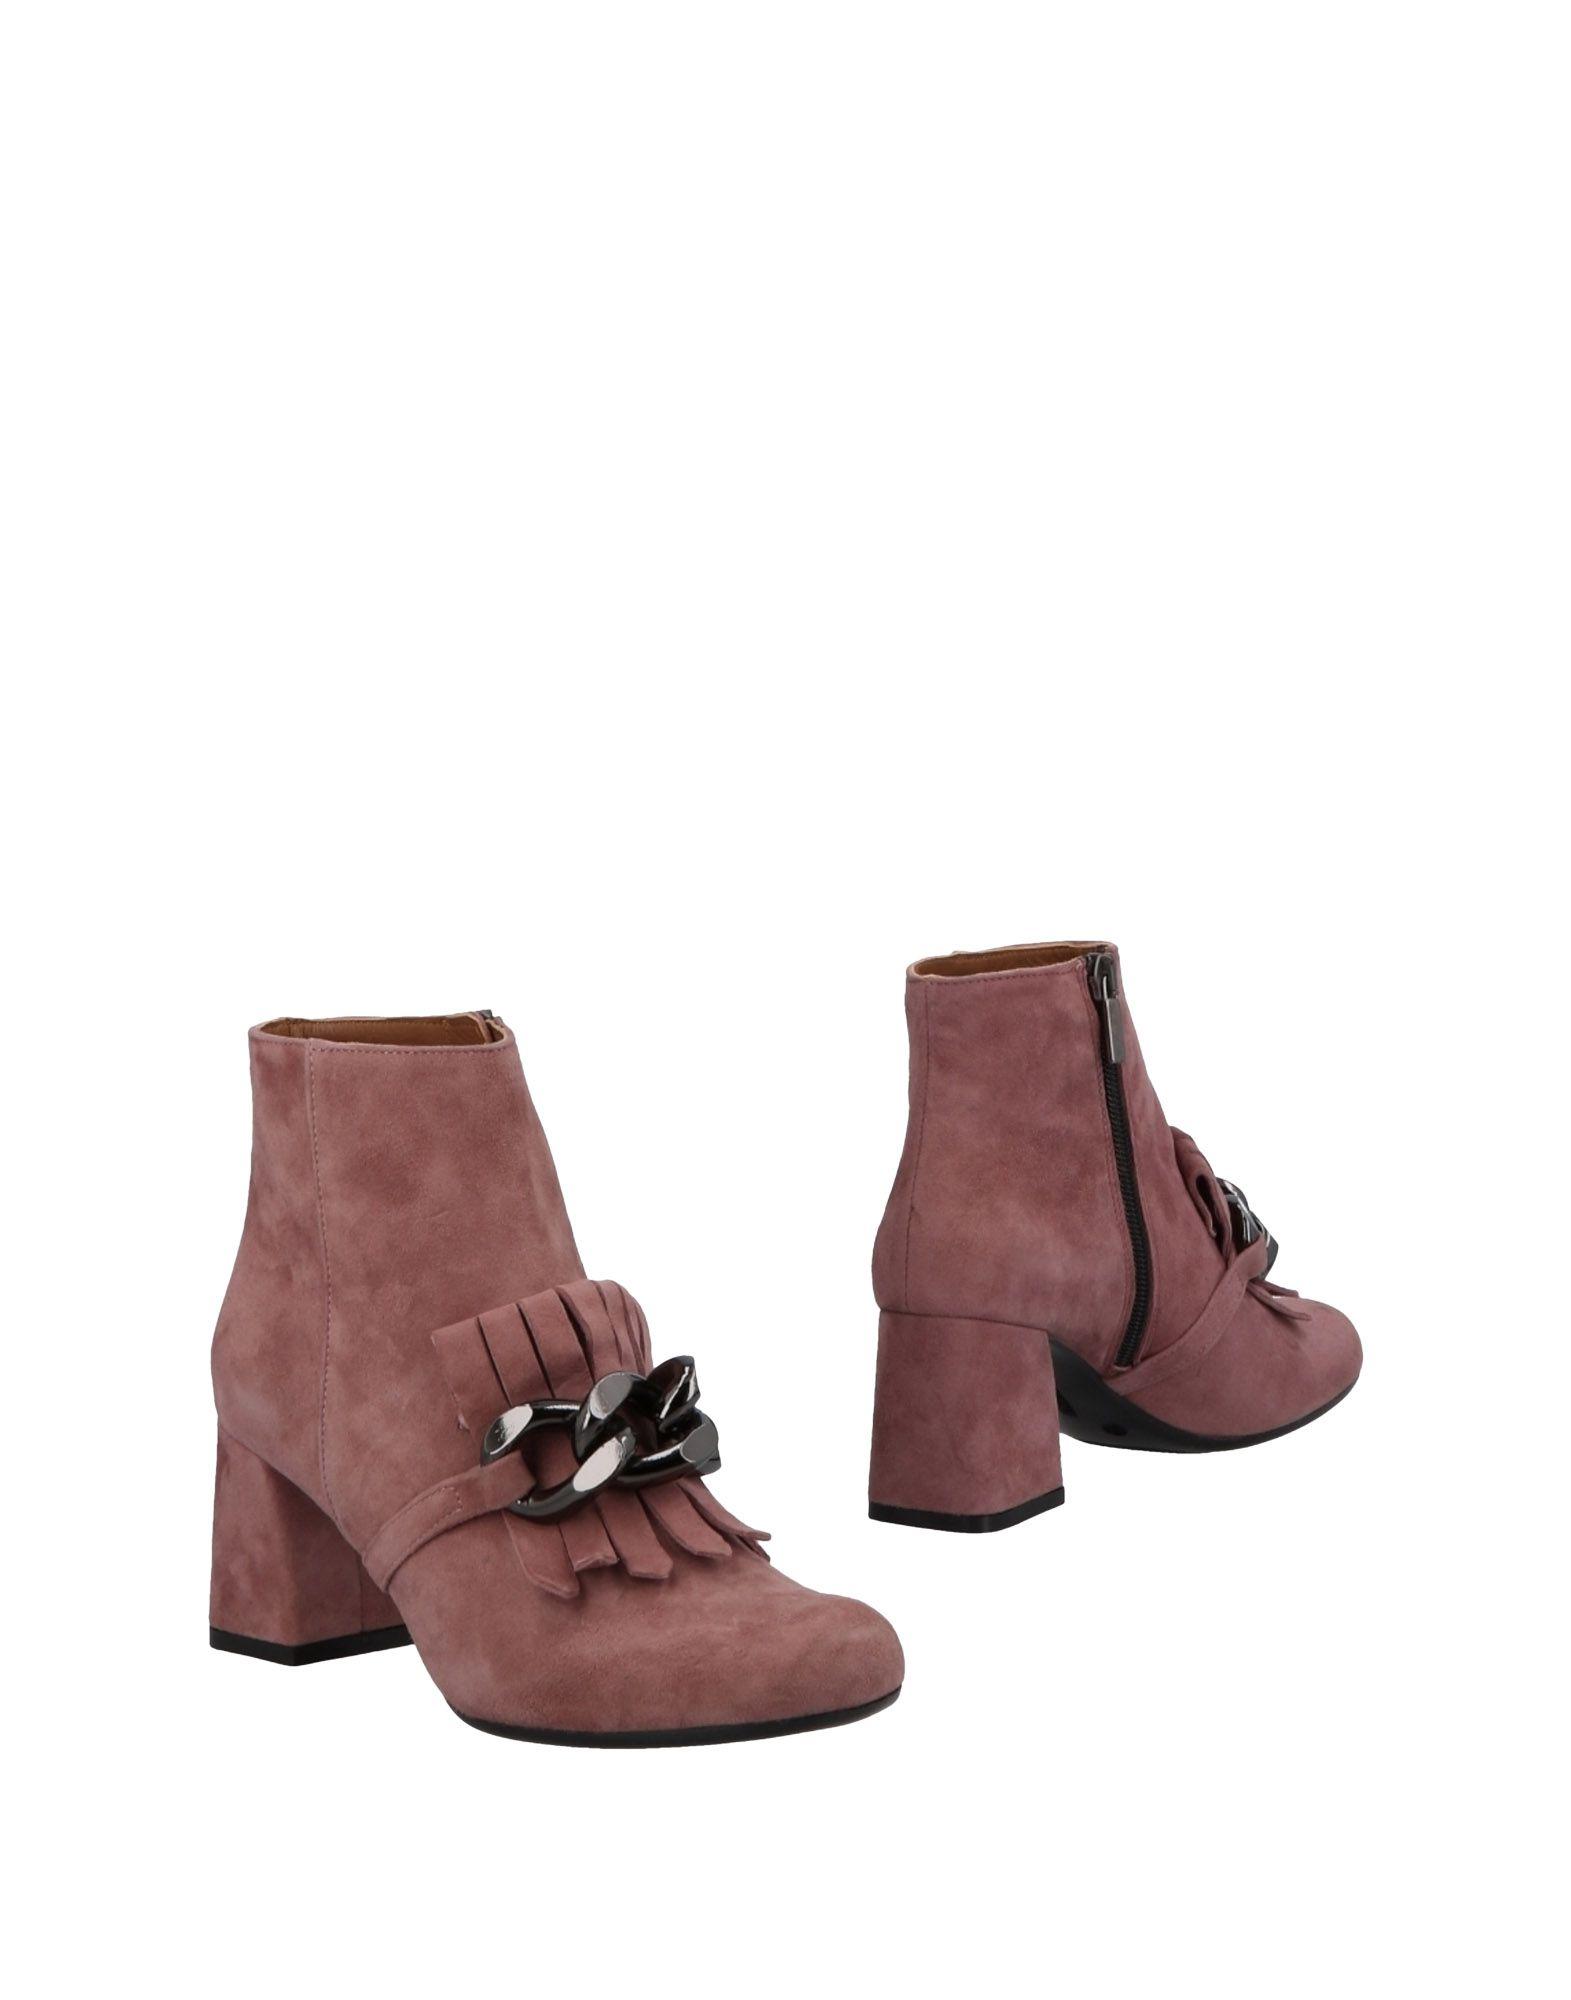 Daniele Women Tortora Ankle Boot - Women Daniele Daniele Tortora Ankle Boots online on  Australia - 11494442EE bef76a